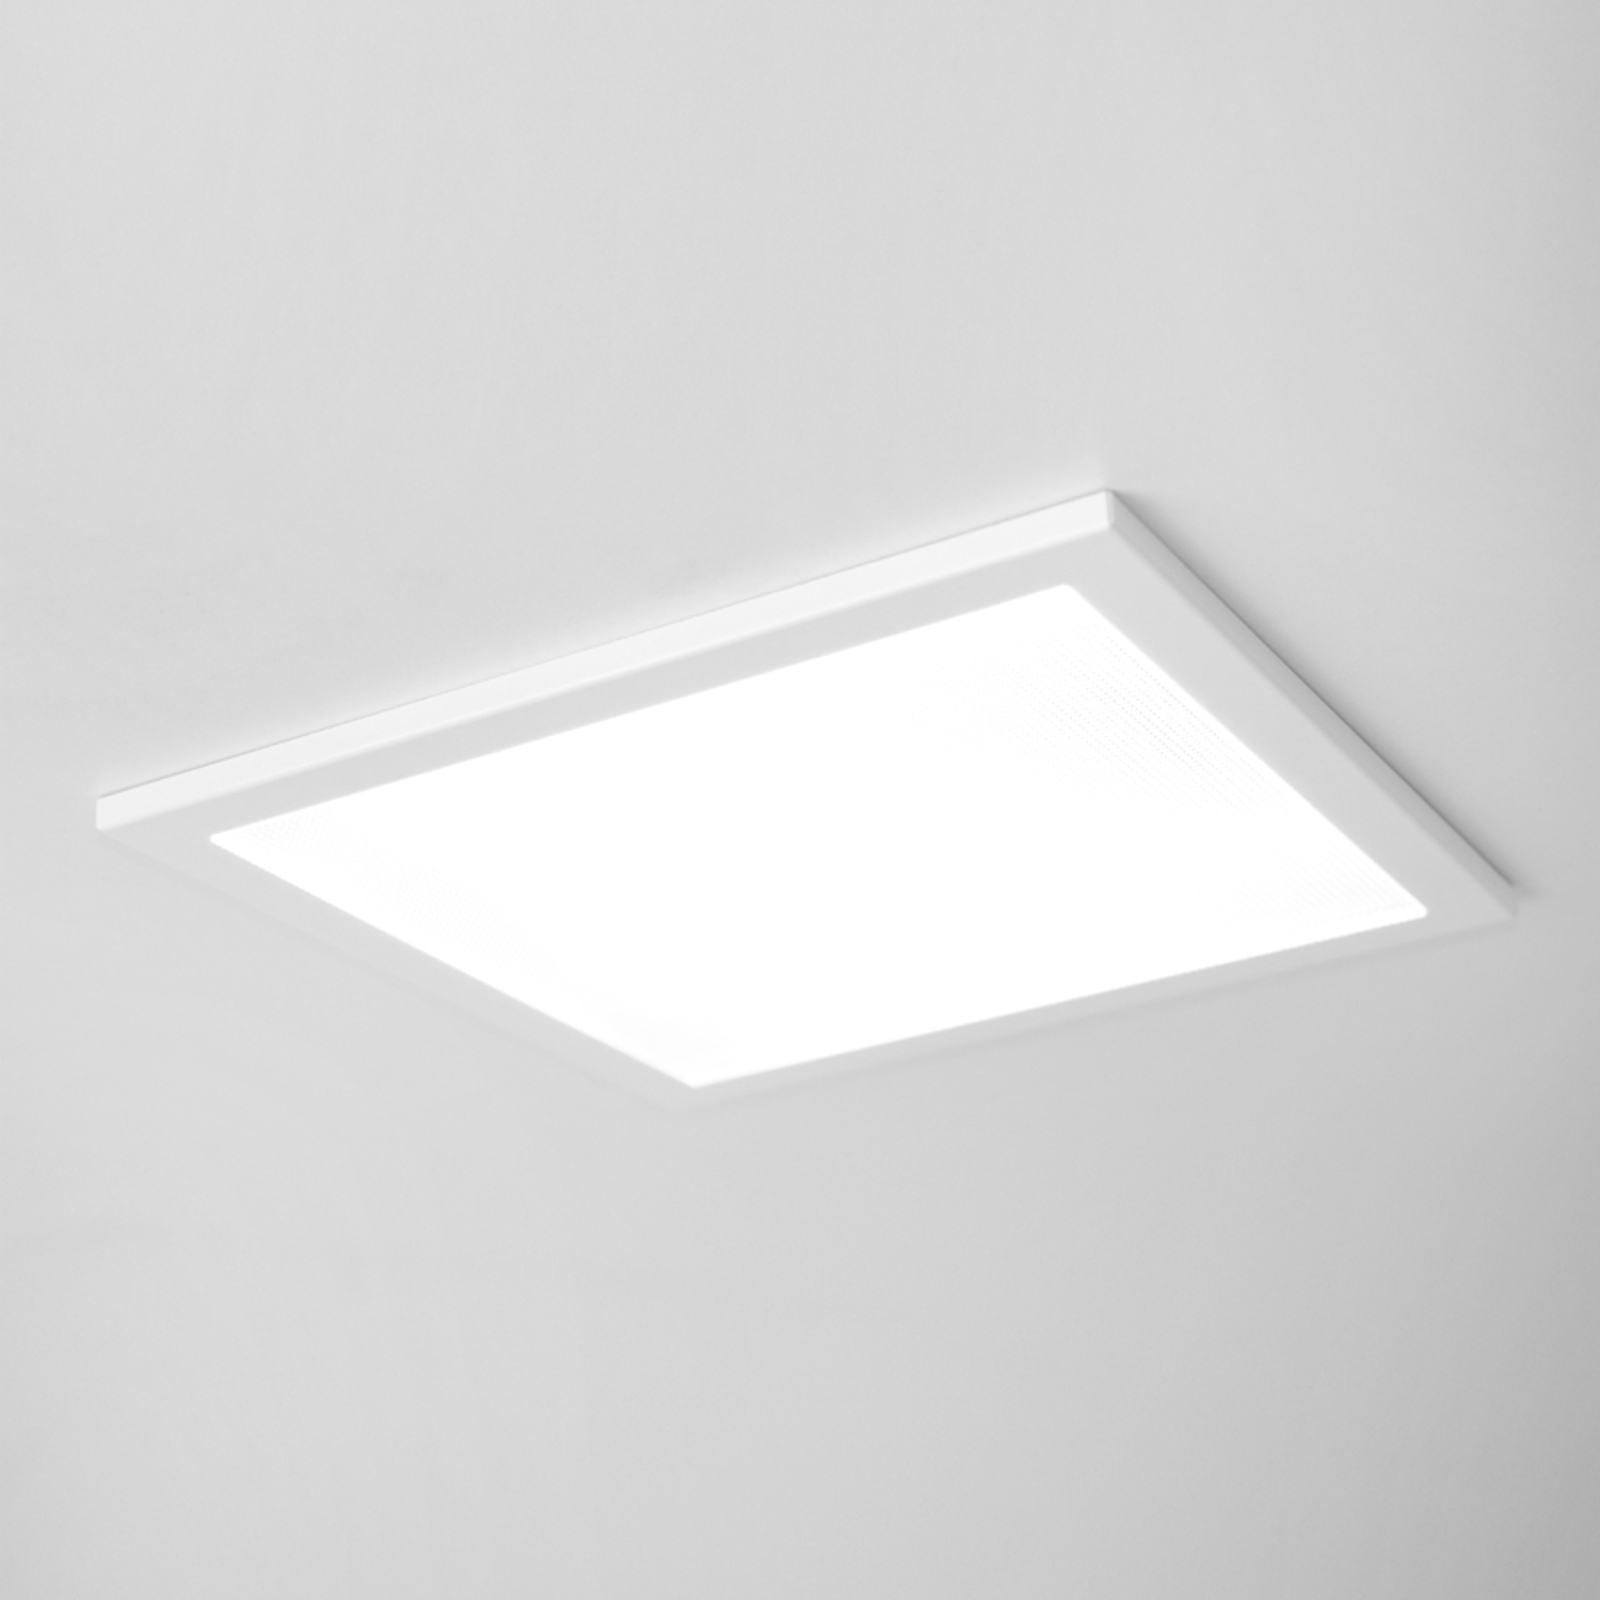 Plafonnier encastrable LED SUN 9, plat blanc 4 k